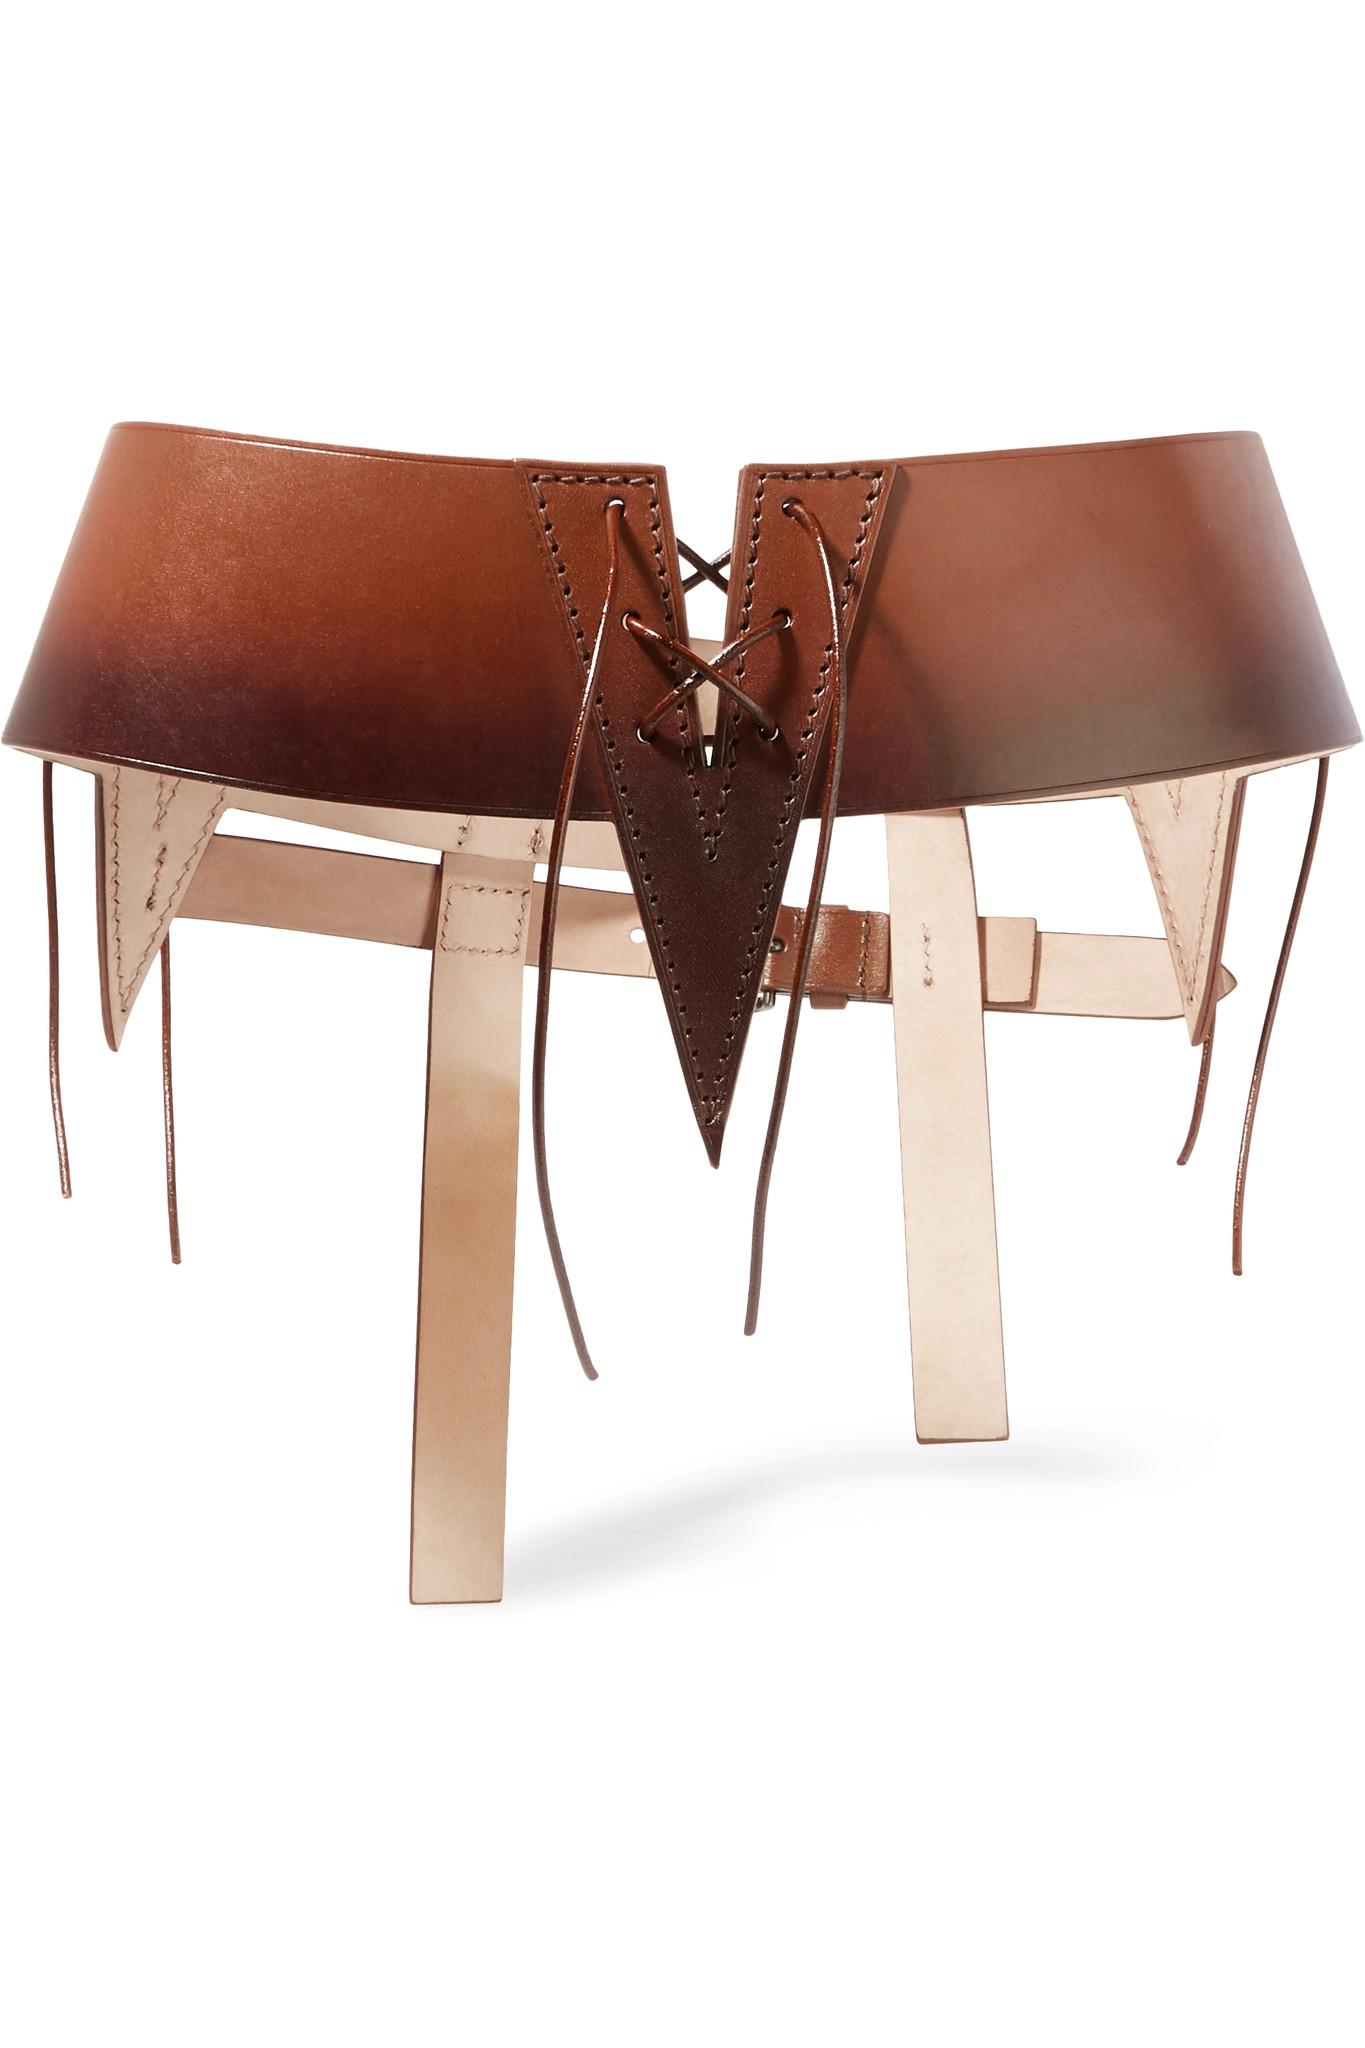 Tom ford Cutout Ombré Leather Waist Belt